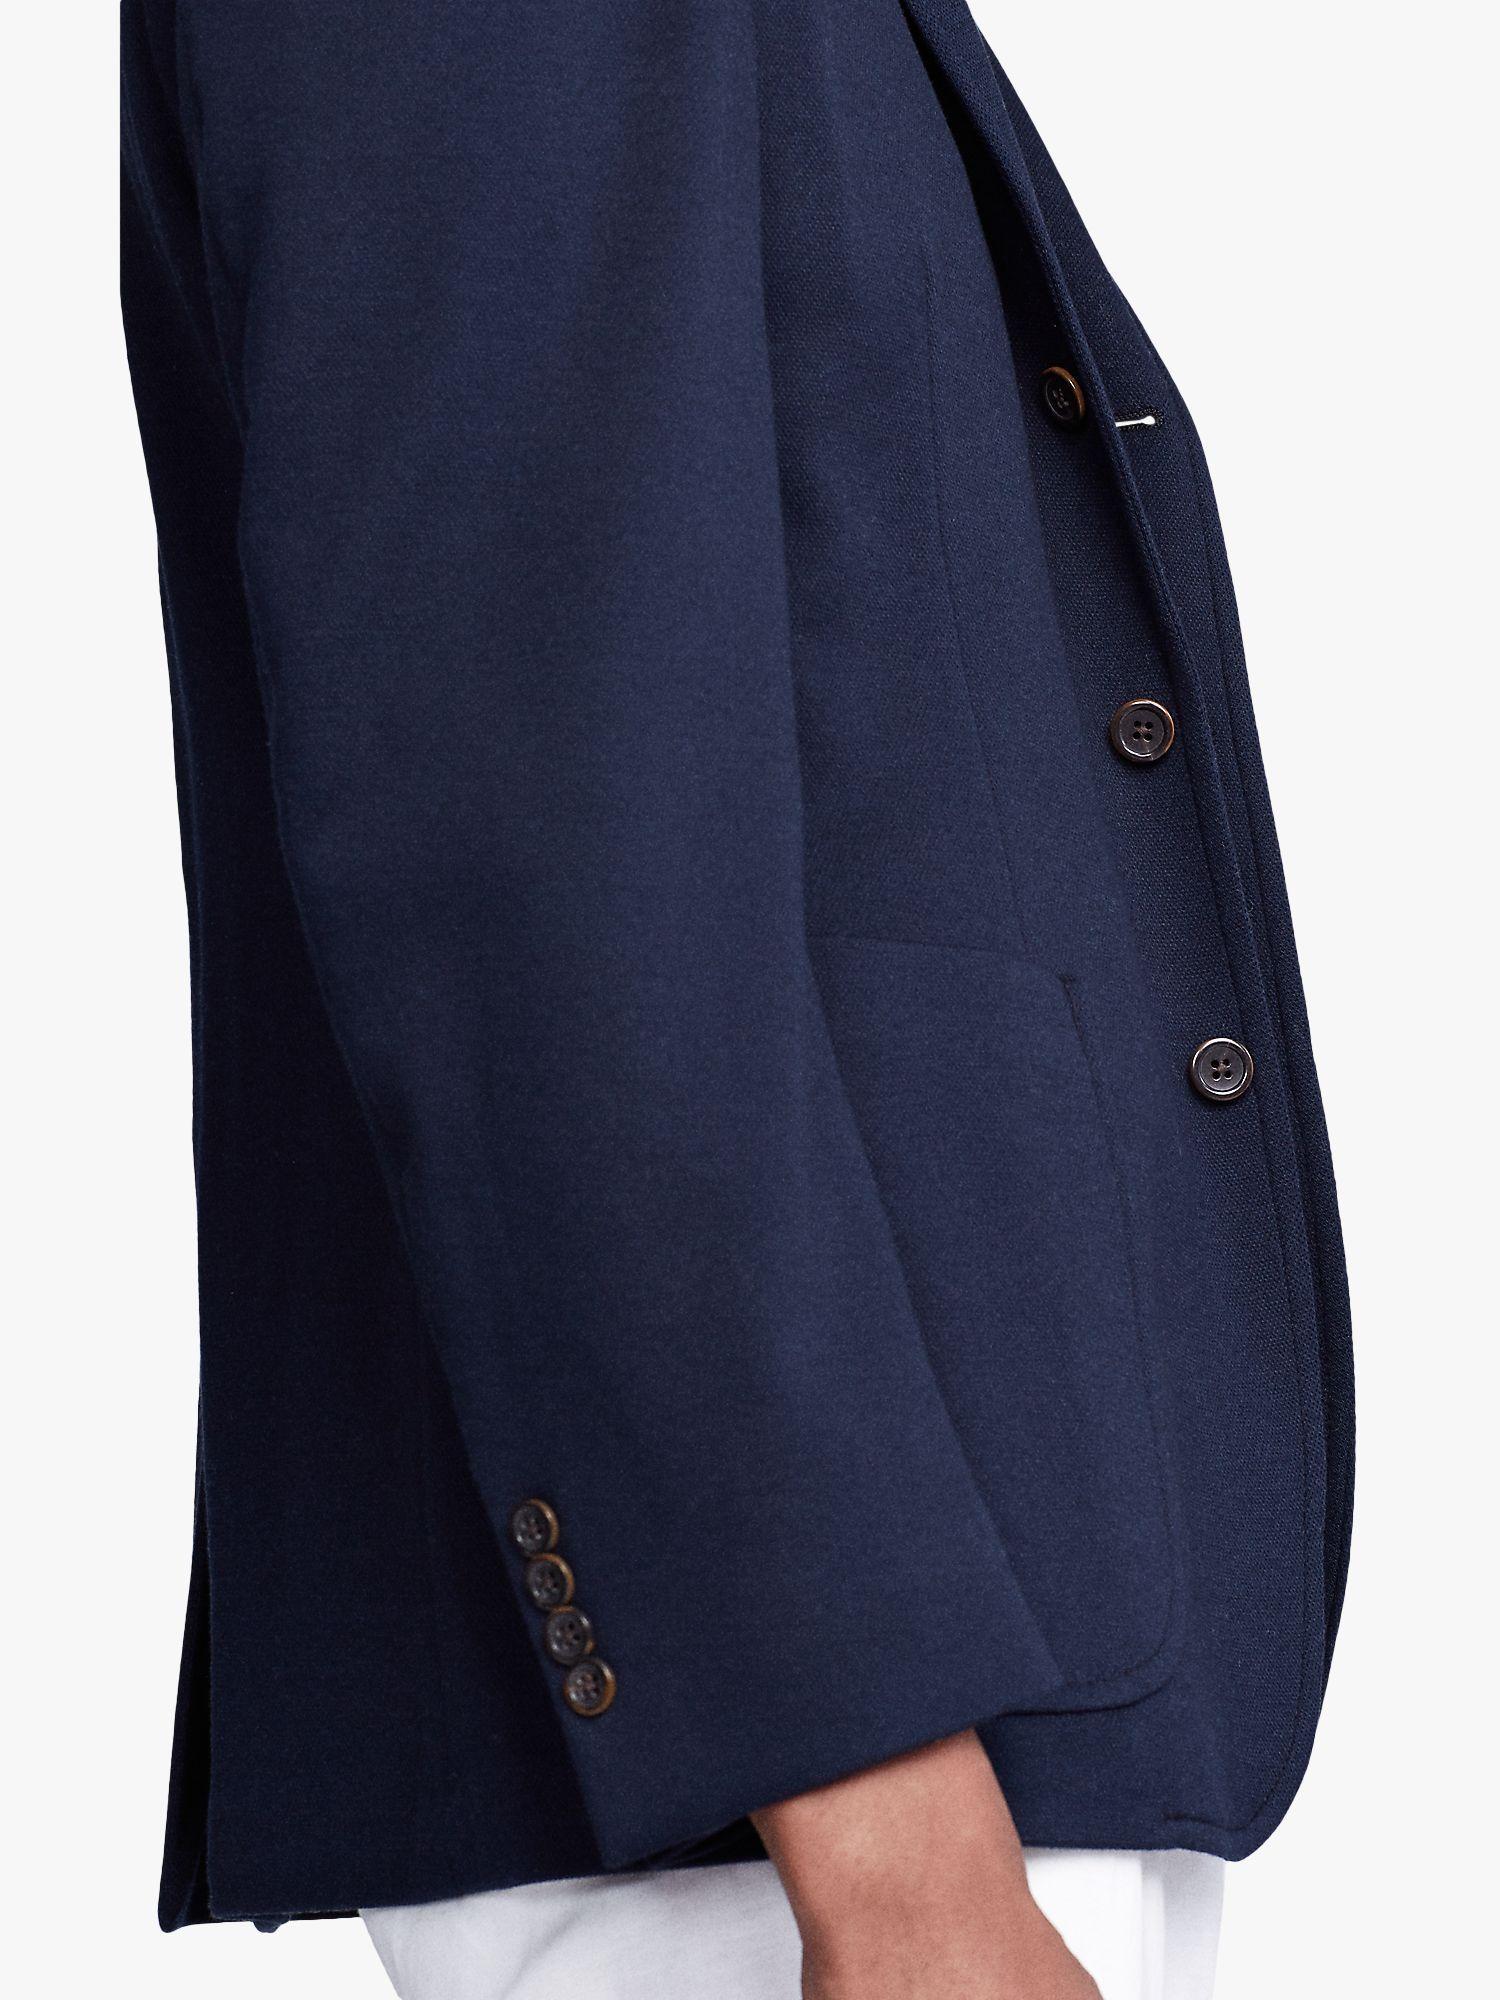 Polo Ralph Lauren Knit Mesh Cotton Blazer Navy In 2020 Cotton Blazer Polo Ralph Lauren Slim Chinos